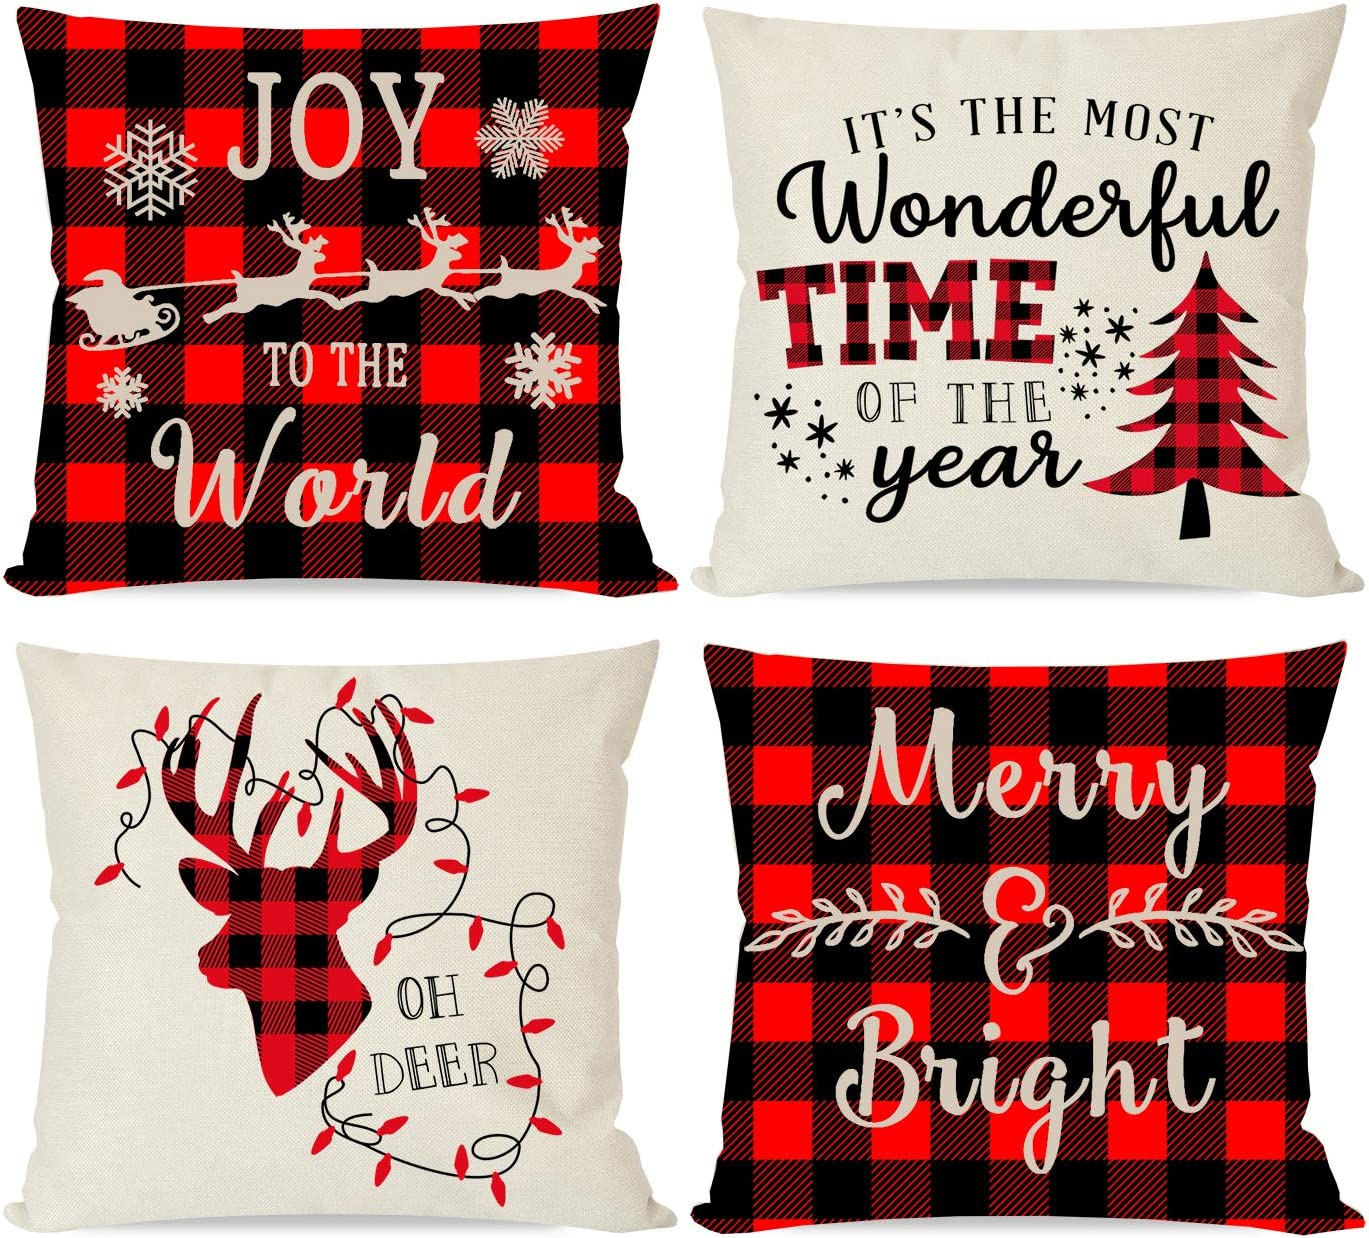 Christmas Throw Pillow Covers 18x18 Set of 4 Red and Black Buffalo Plaid Check